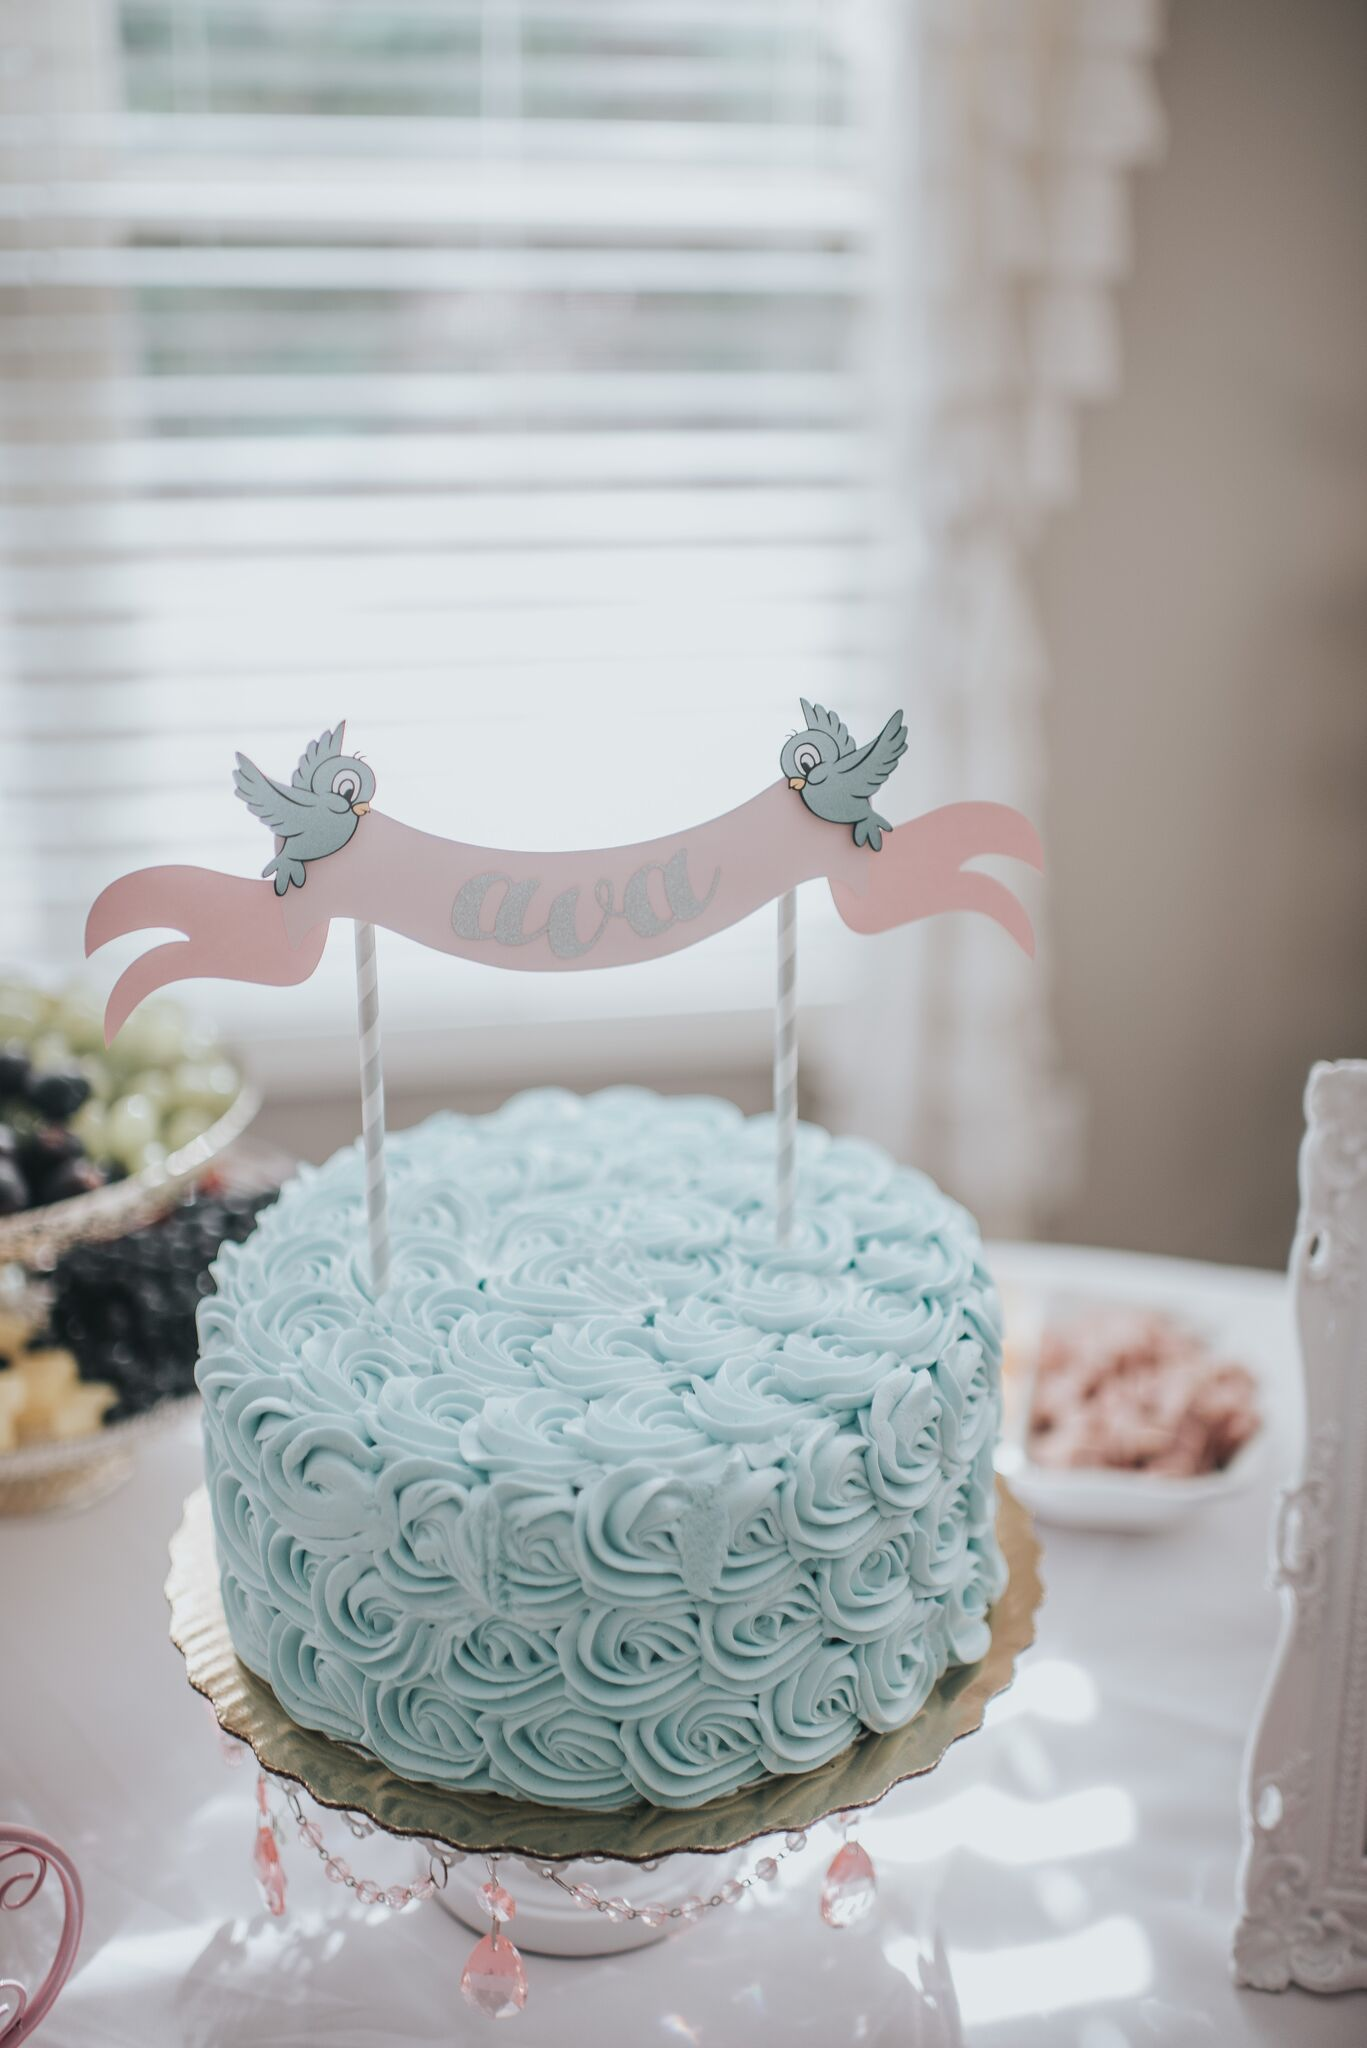 Ava's Cupcake Shoppe Bakeries, Food - Locu